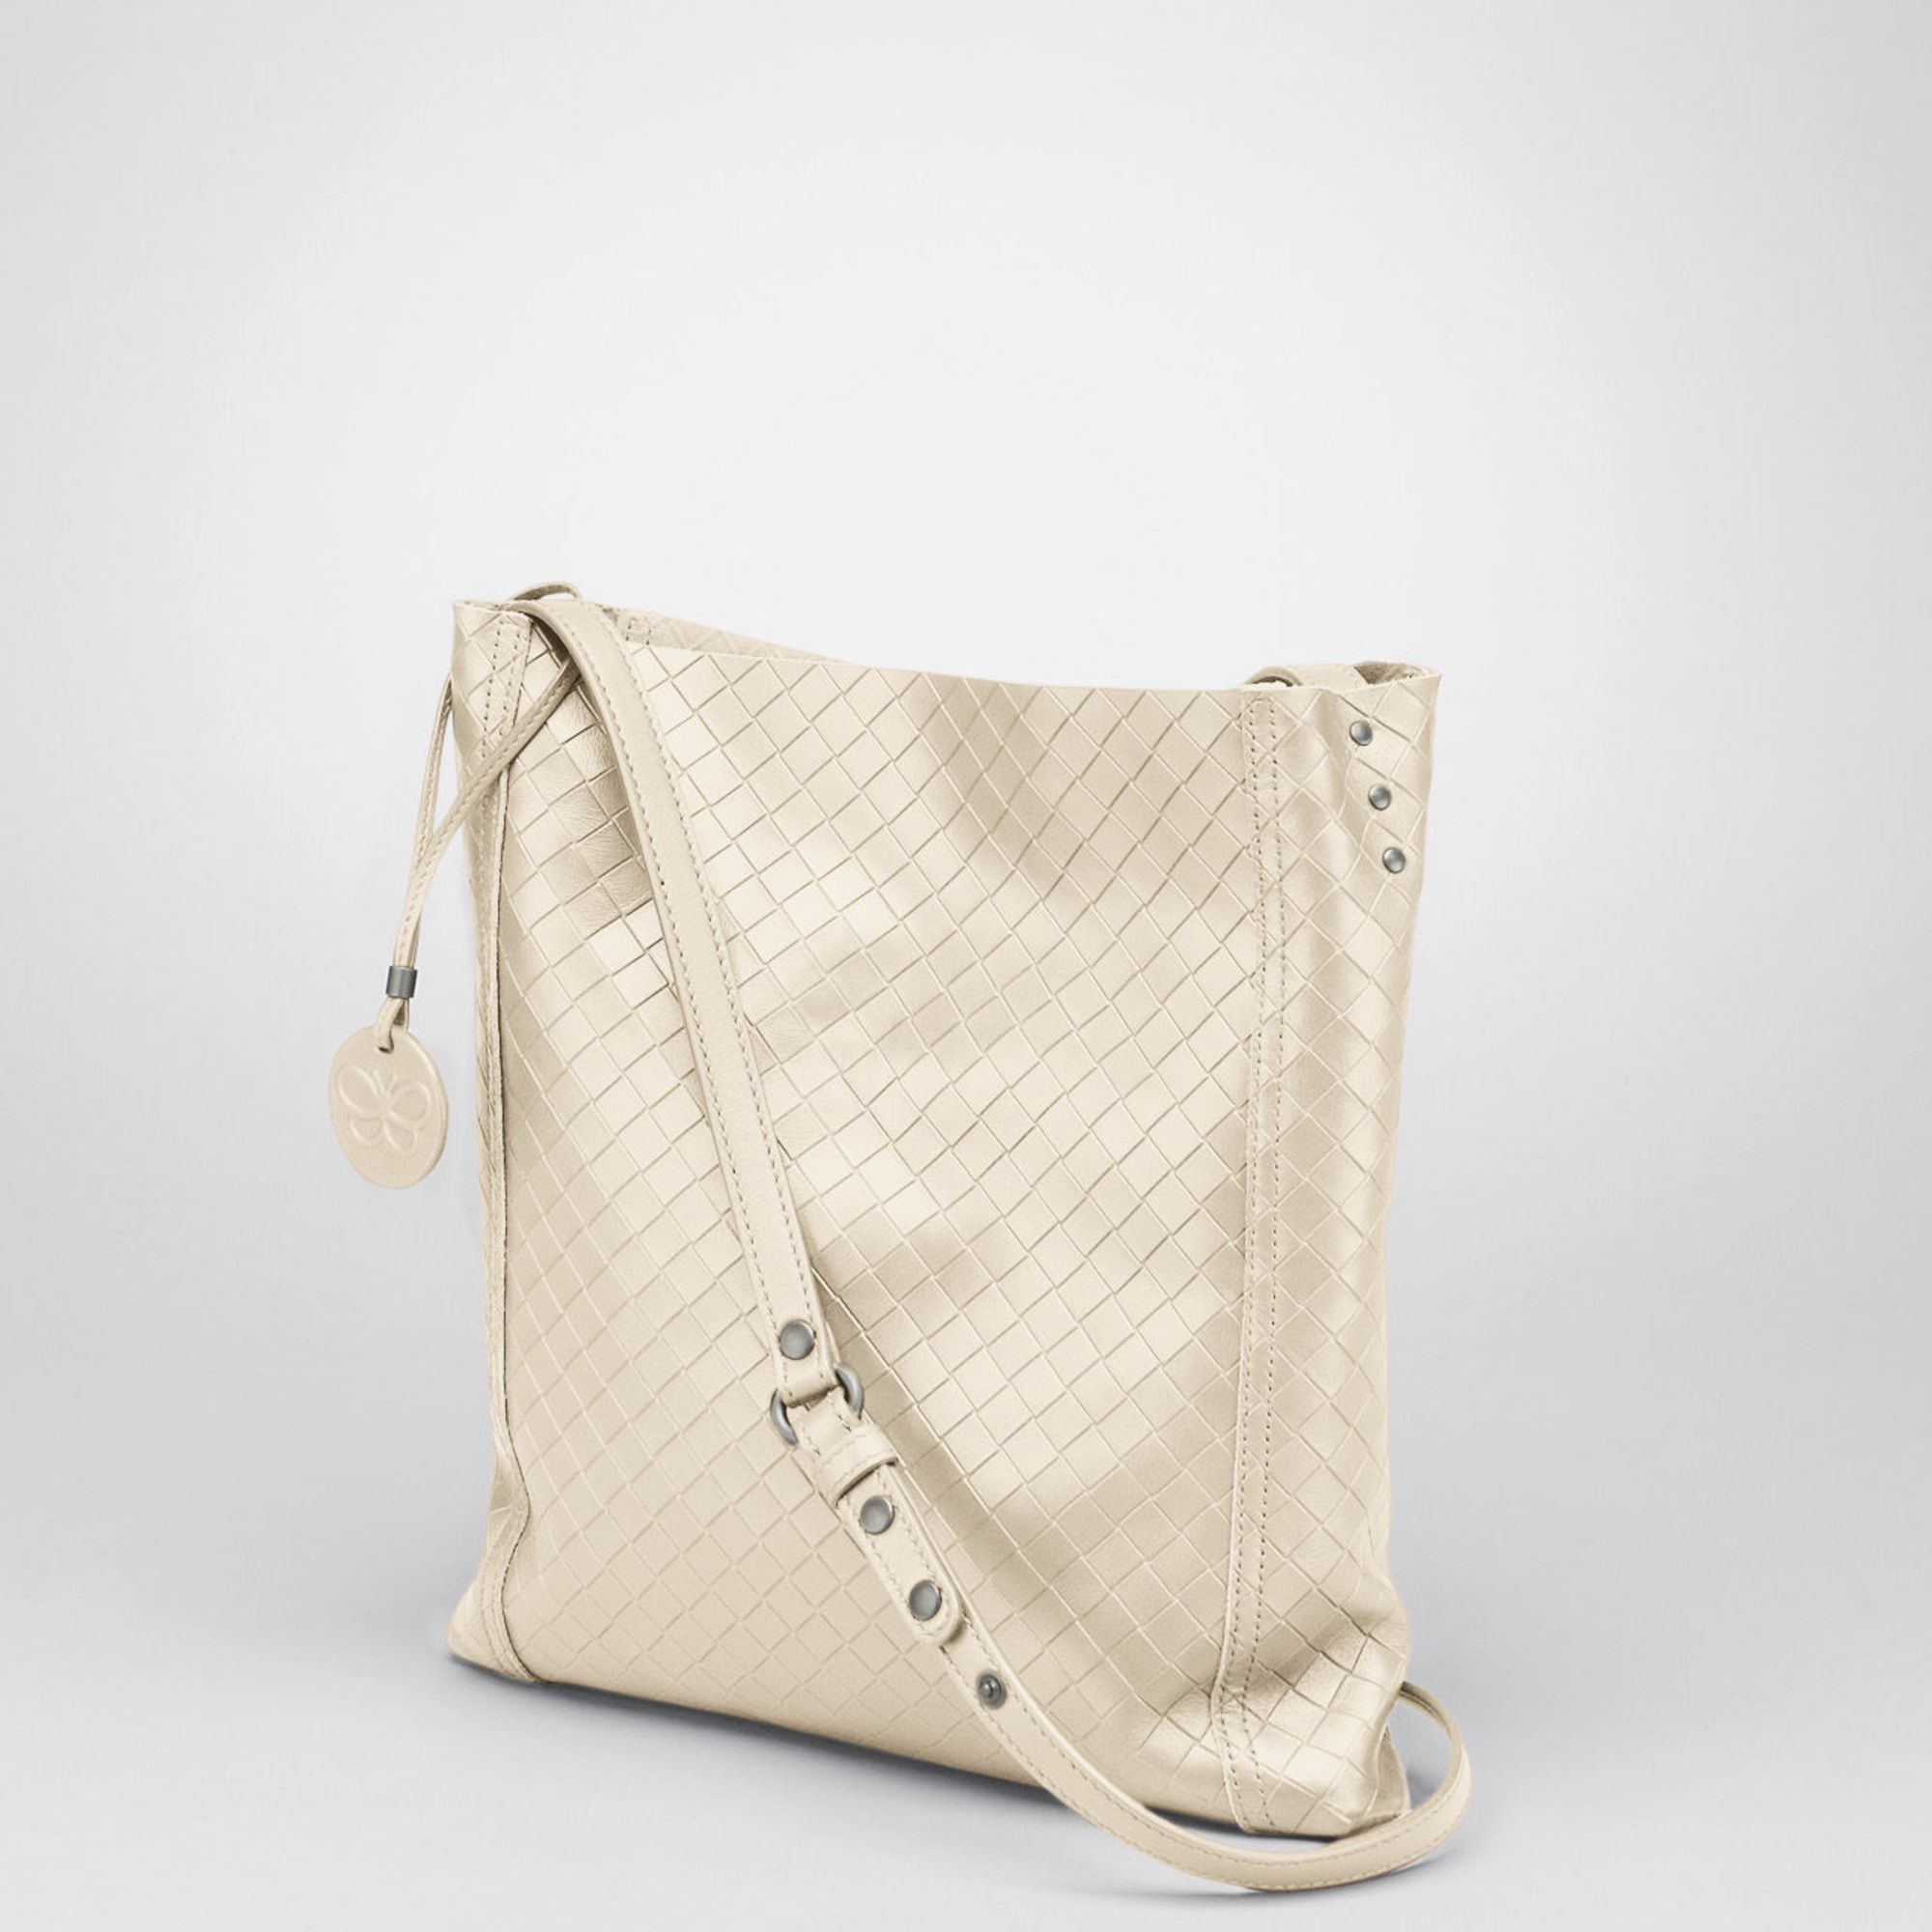 c243748d573a Lyst - Bottega Veneta Nero Intrecciomirage Cross Body Bag in Natural